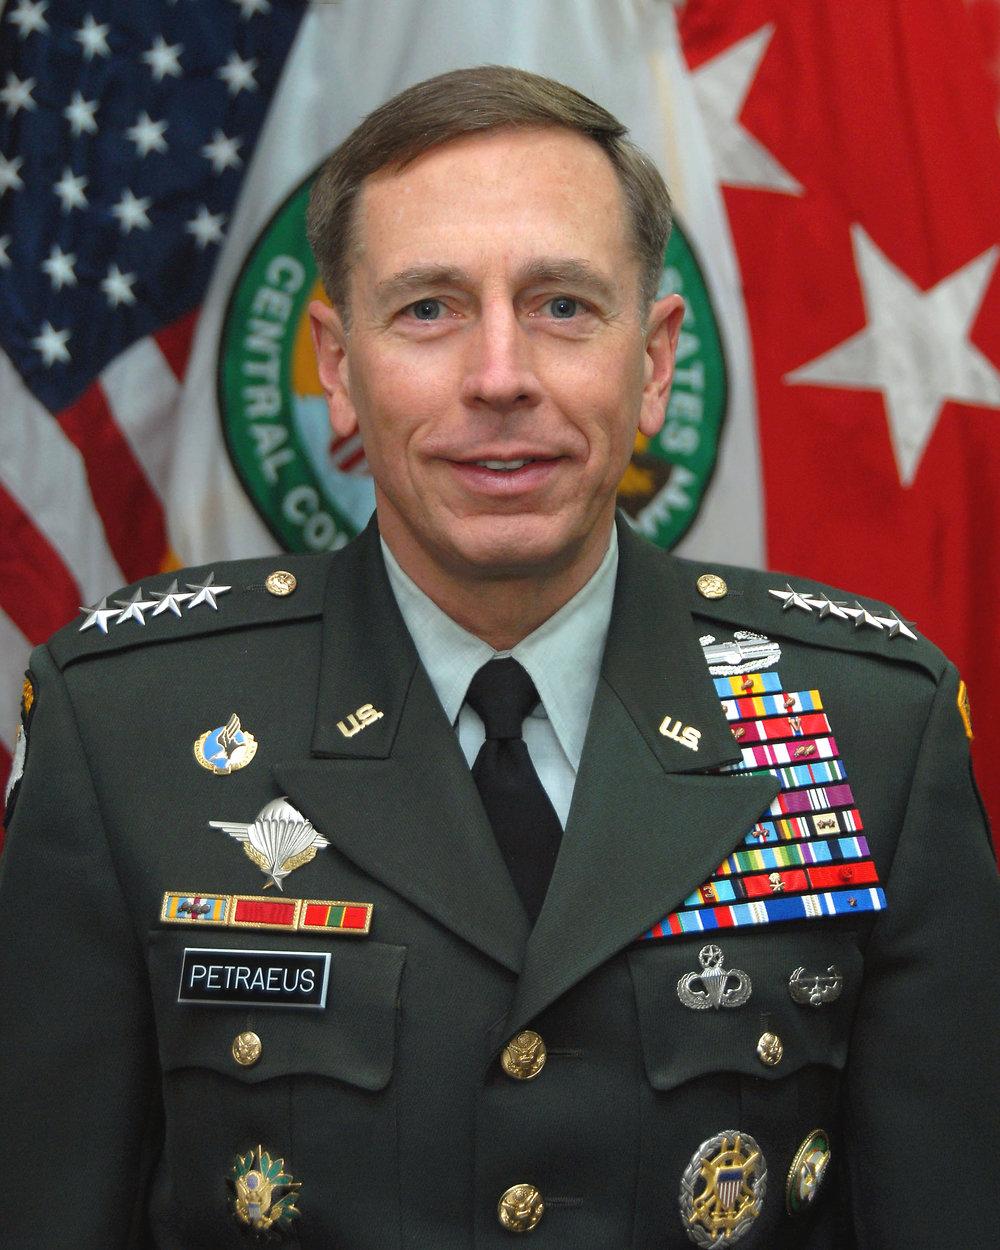 General David H. Petraeus — Lockheed Martin Armed Forces Bowl